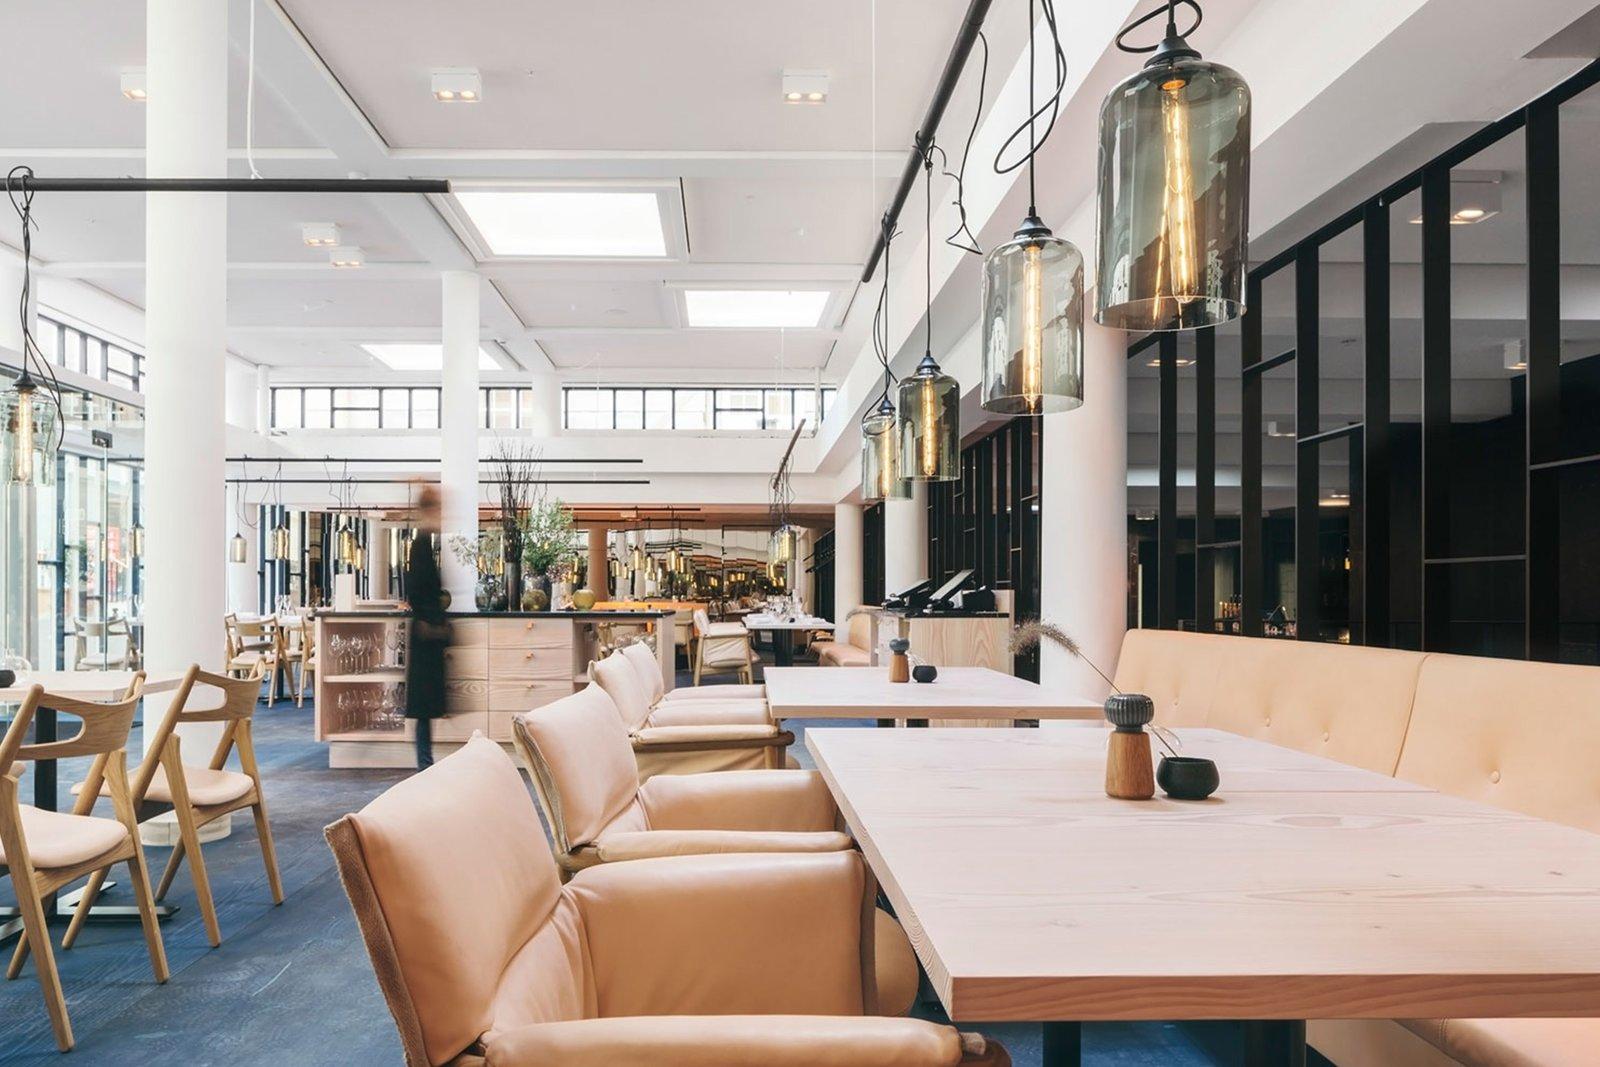 Dining Room, Chair, Ceiling Lighting, Table, Pendant Lighting, and Bench  Nobis Hotel Copenhagen